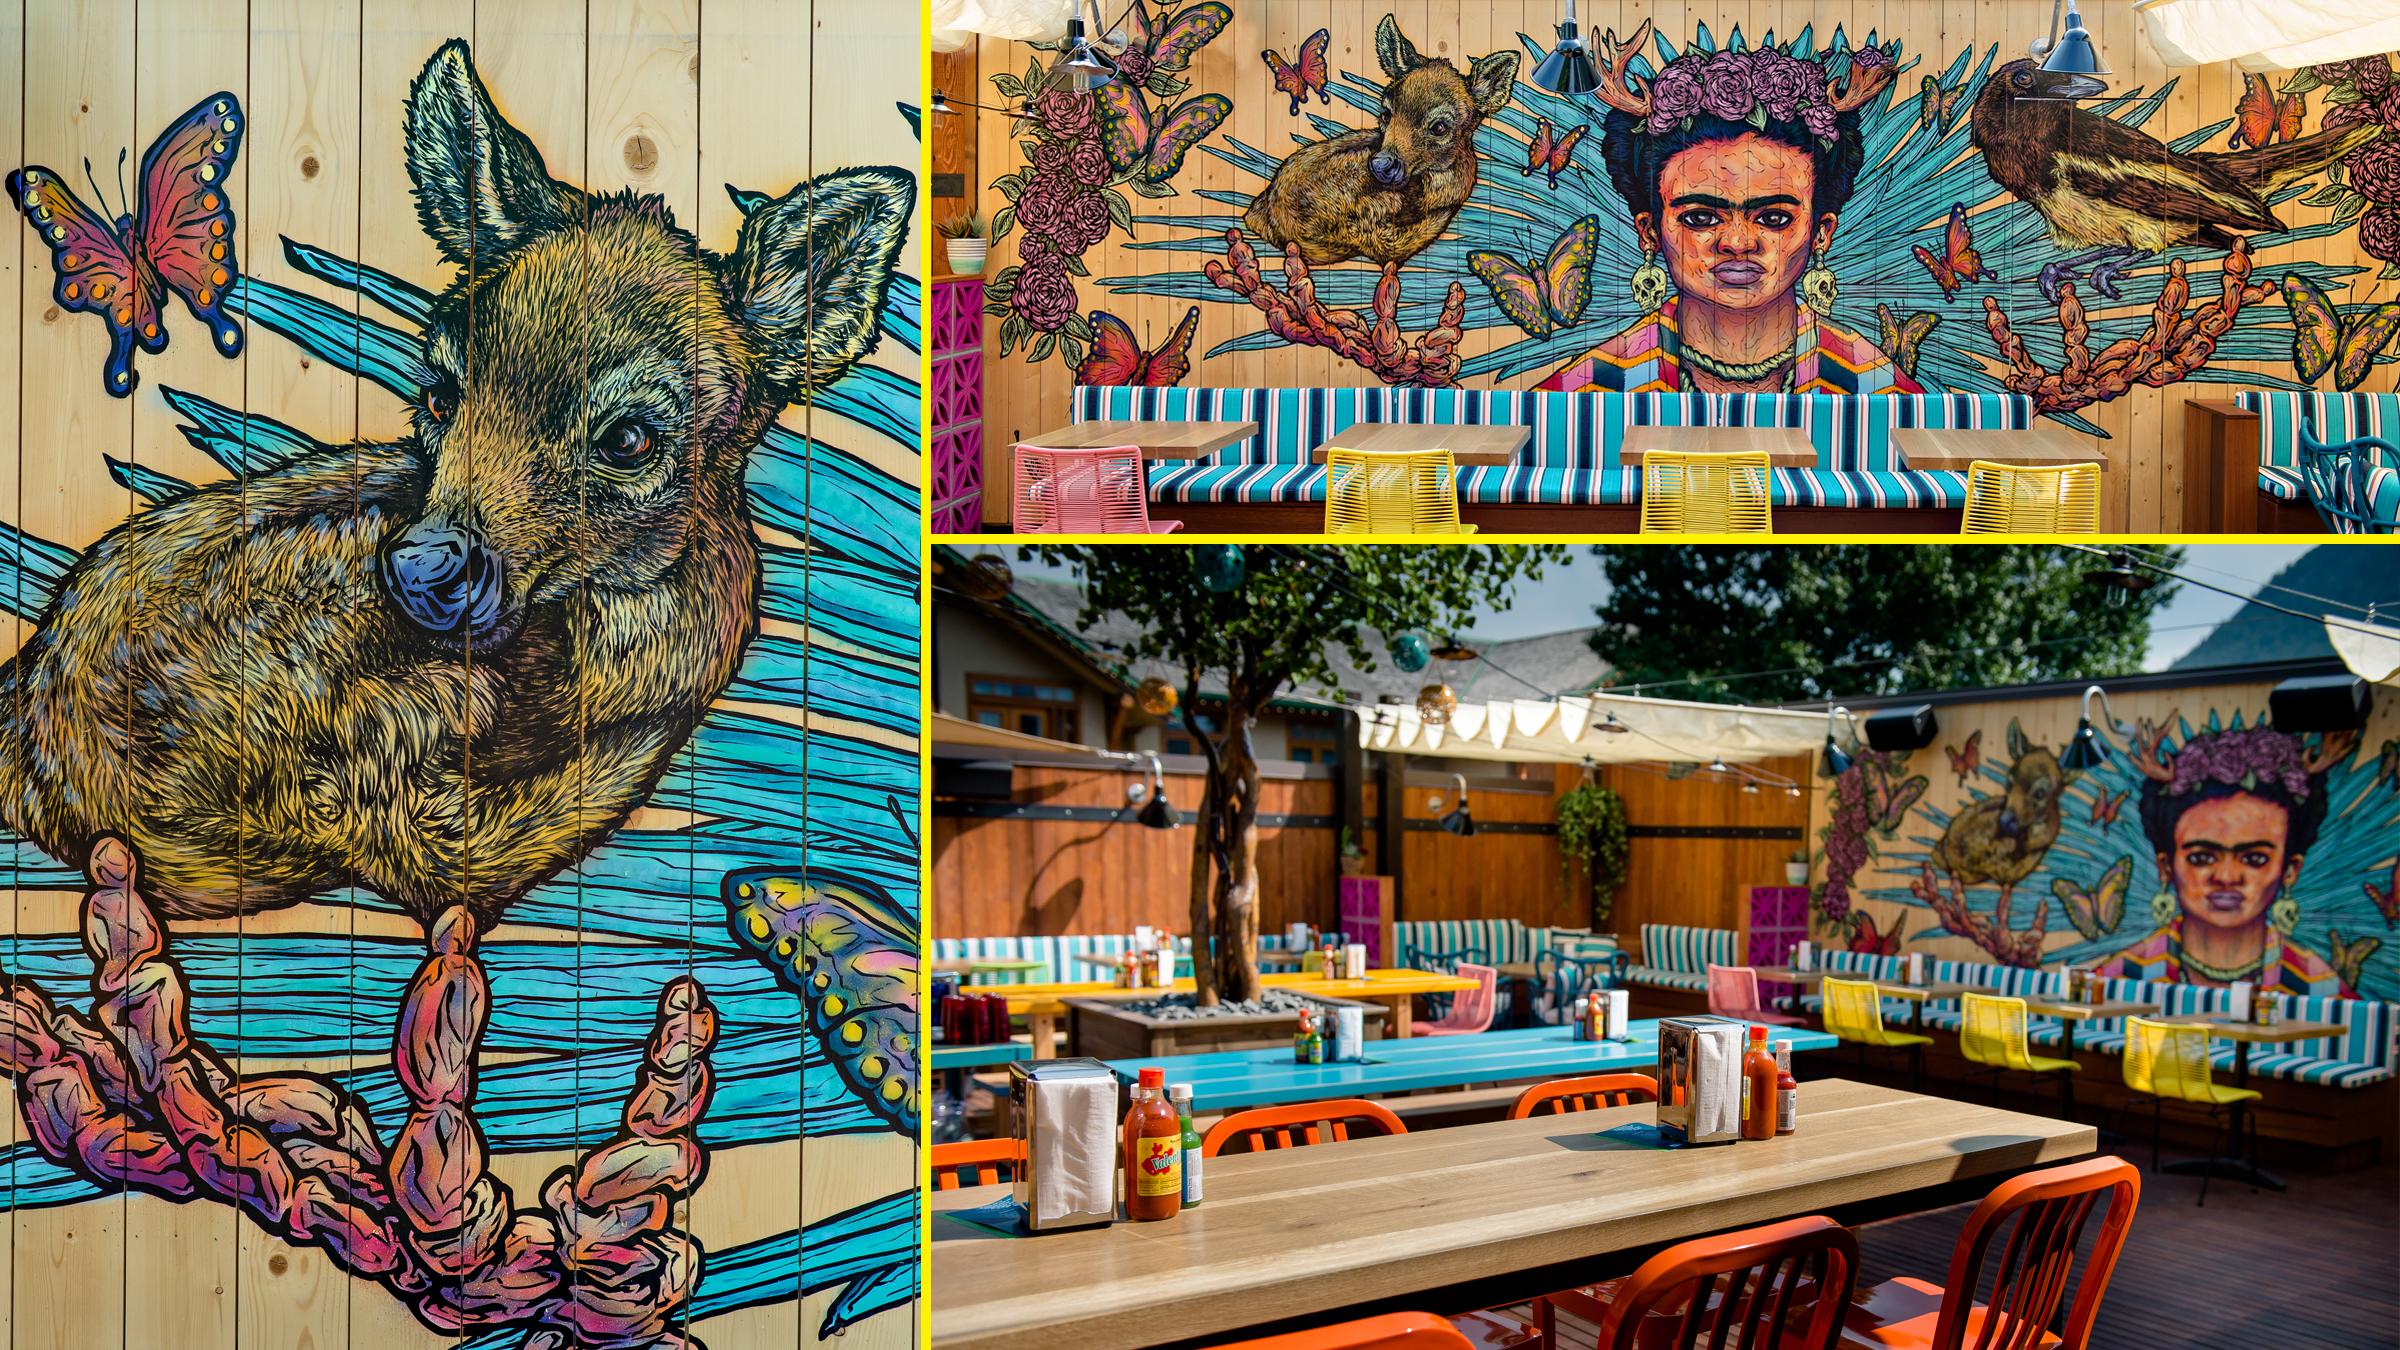 rooftop mural at el patio. banff, canada.